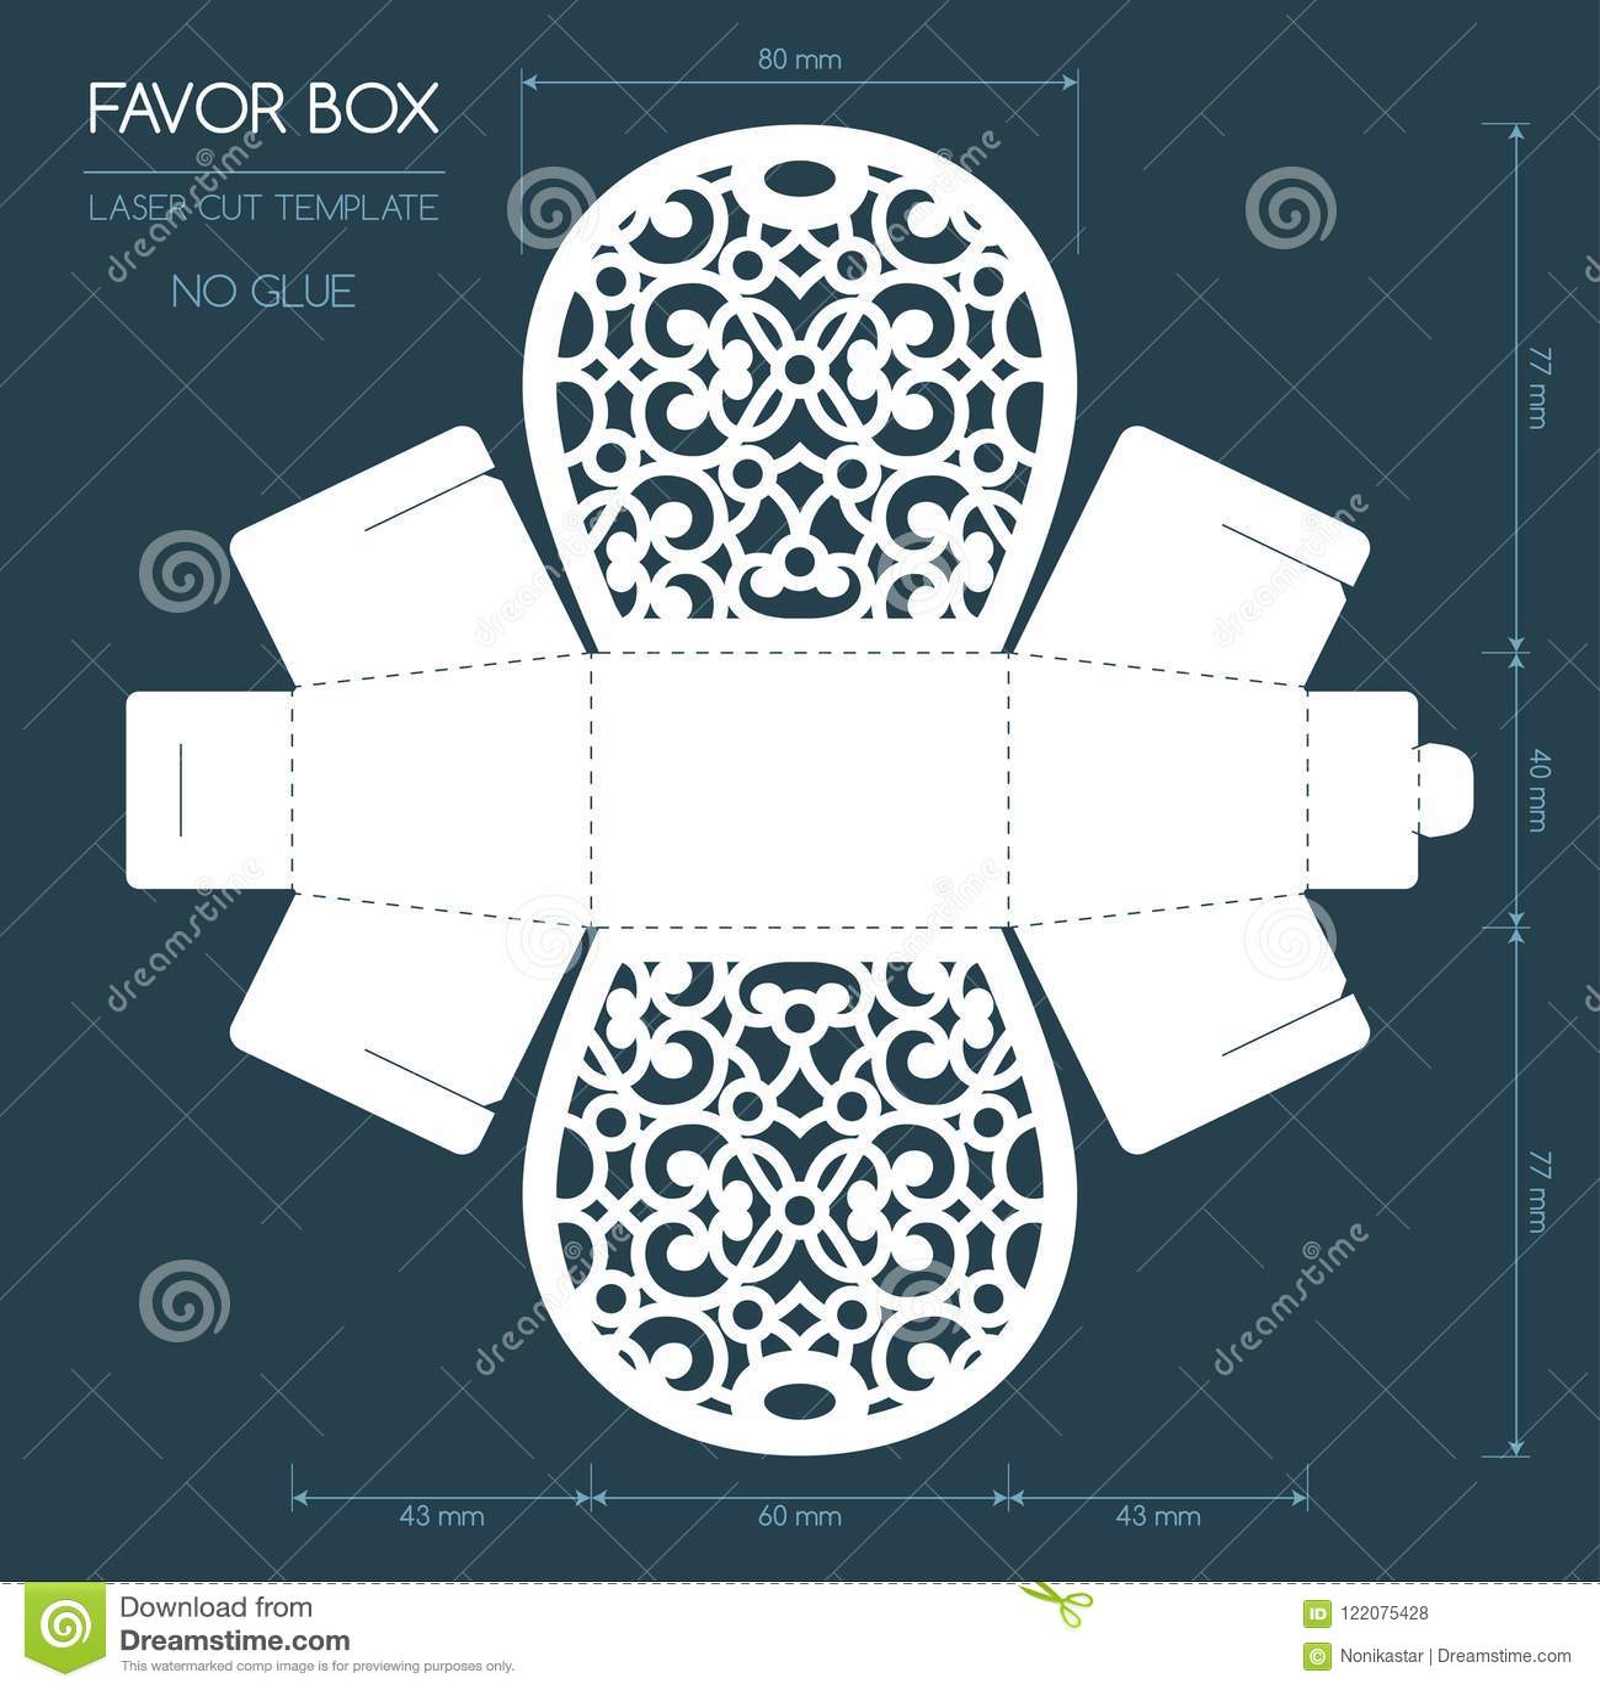 Caja del favor del corte del laser